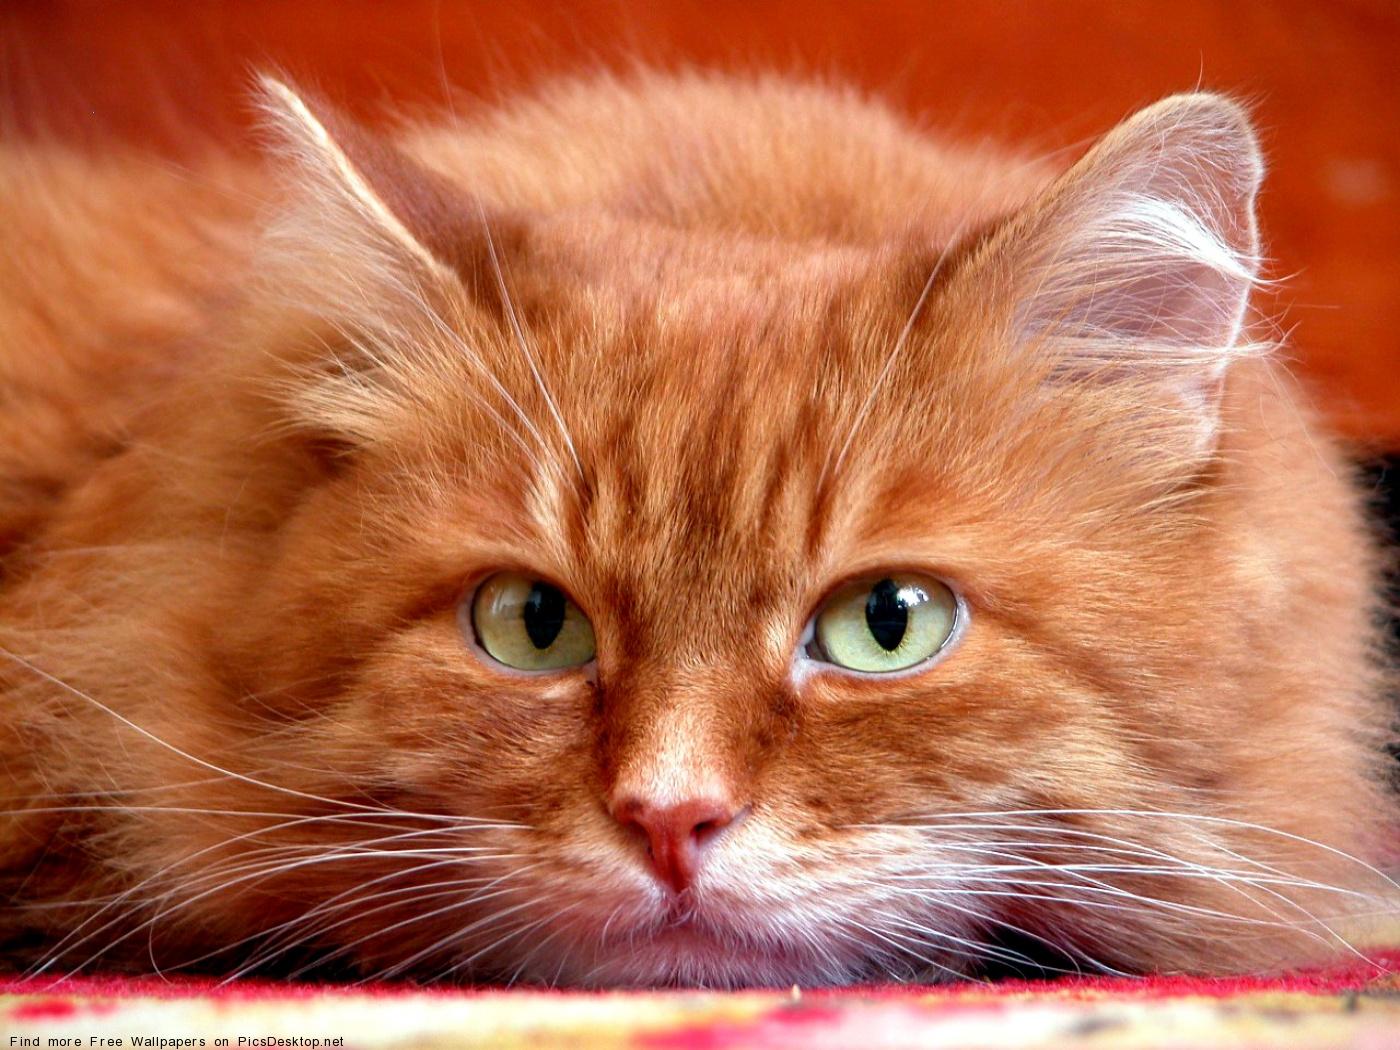 http://picsdesktop.net/Pets/1400x1050/PicsDesktop.net_88.jpg